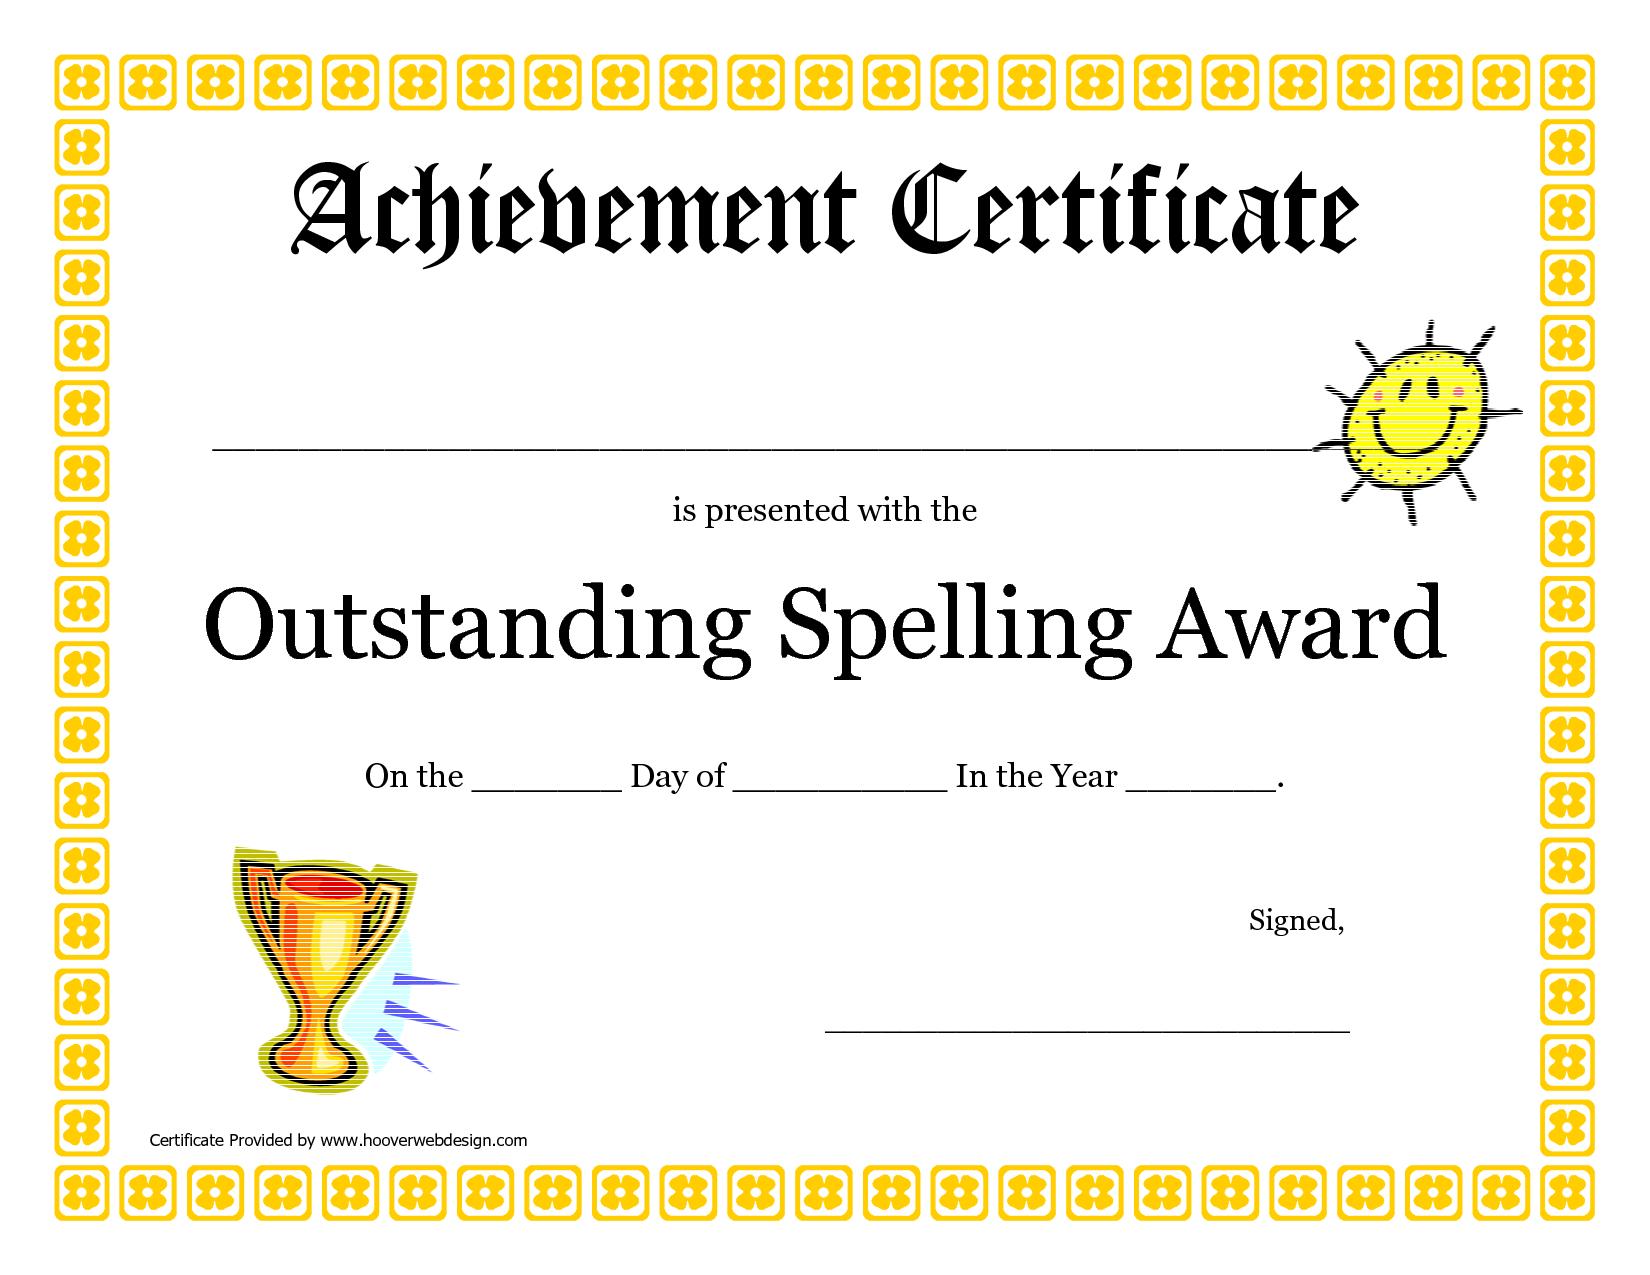 Outstanding Spelling Award Printable Certificate Pdf Picture In Spelling Bee Award Certificate Template